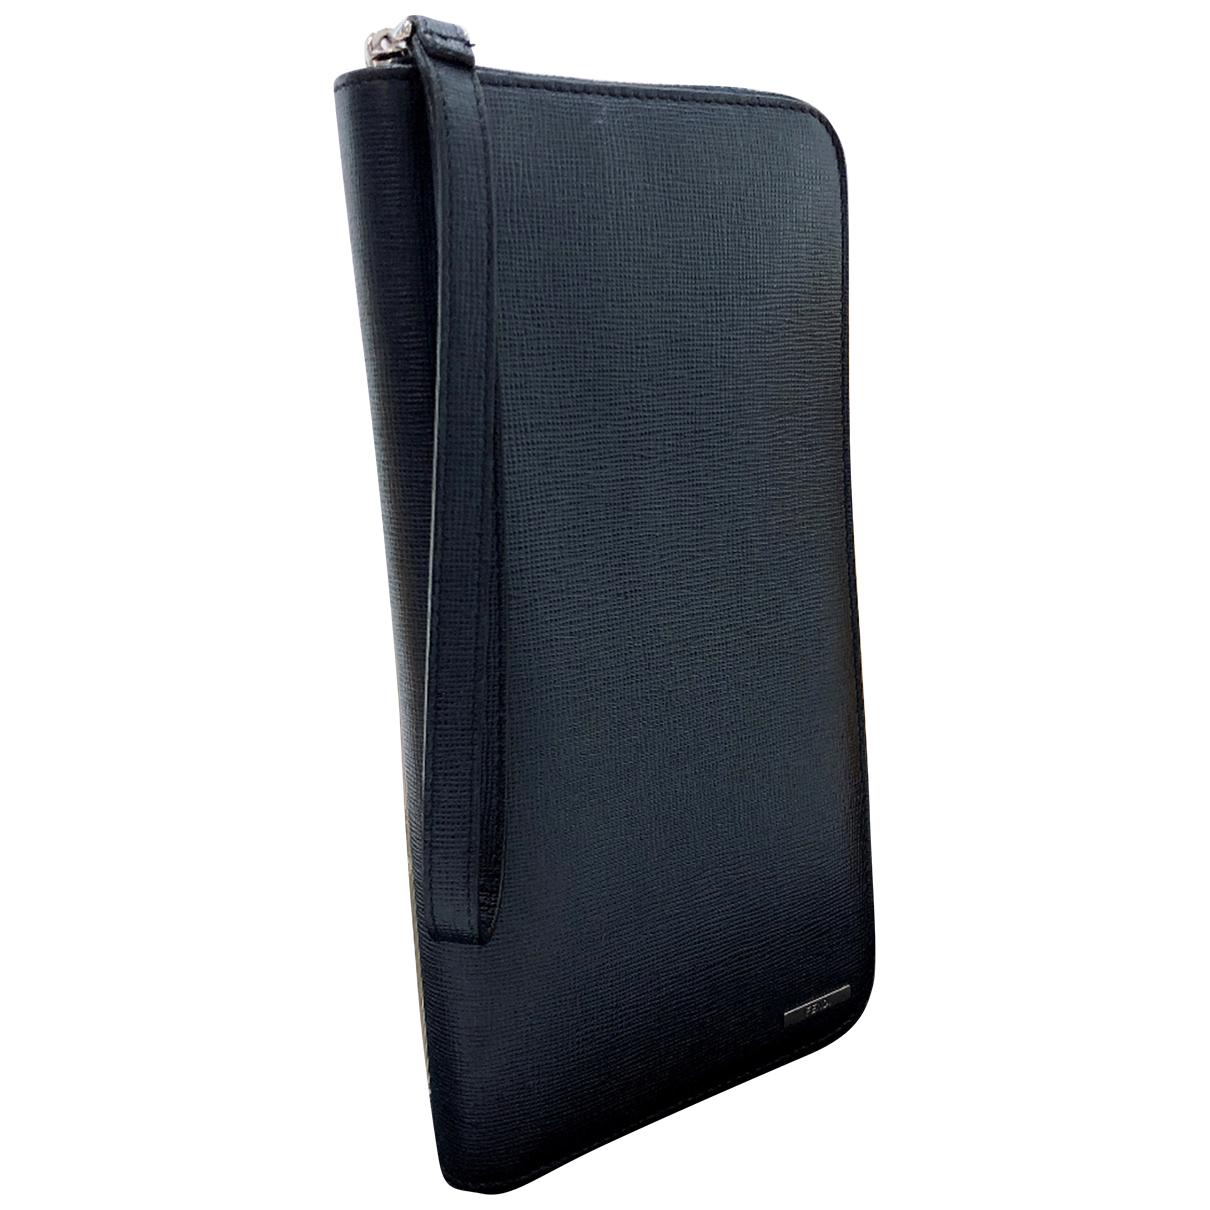 Fendi N Navy Leather Small bag, wallet & cases for Men N